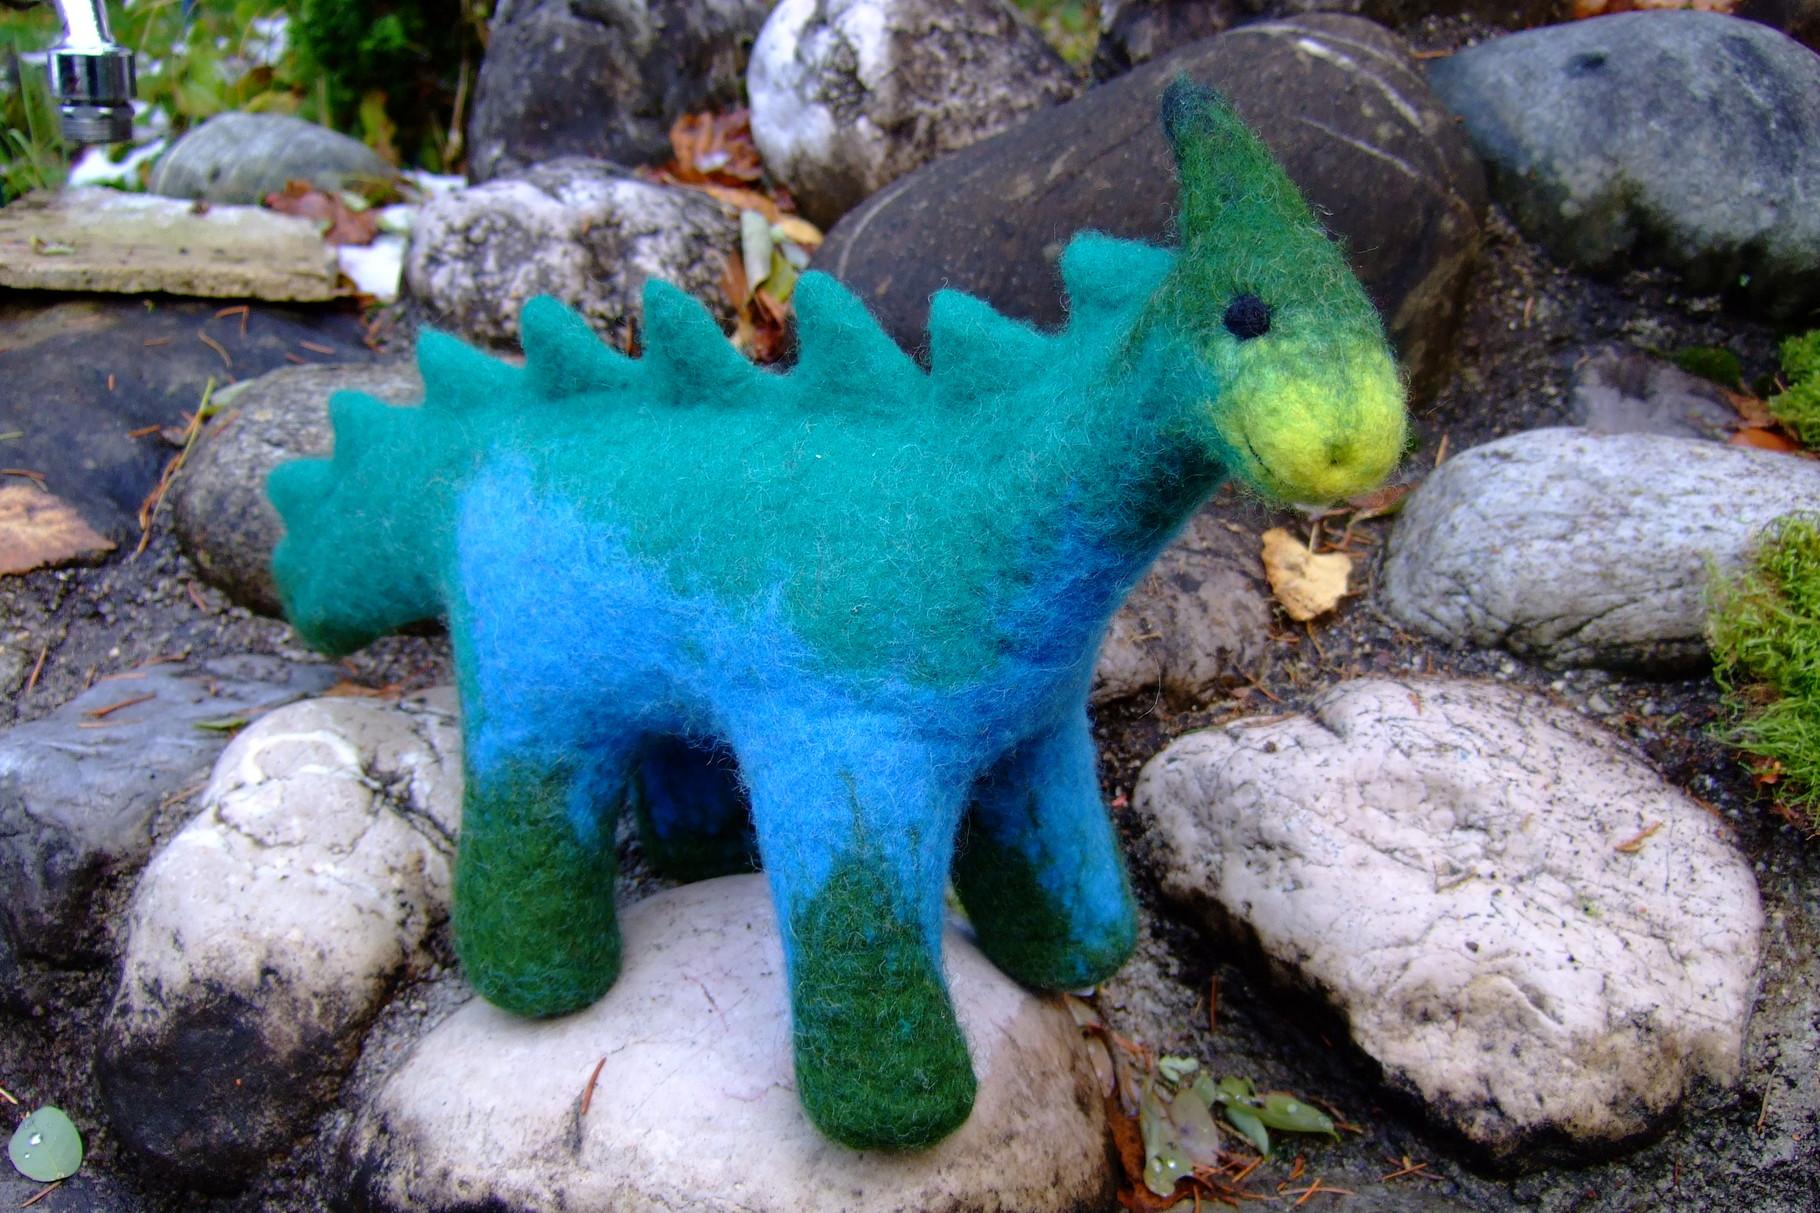 Blaugrüner Dino aus Filz